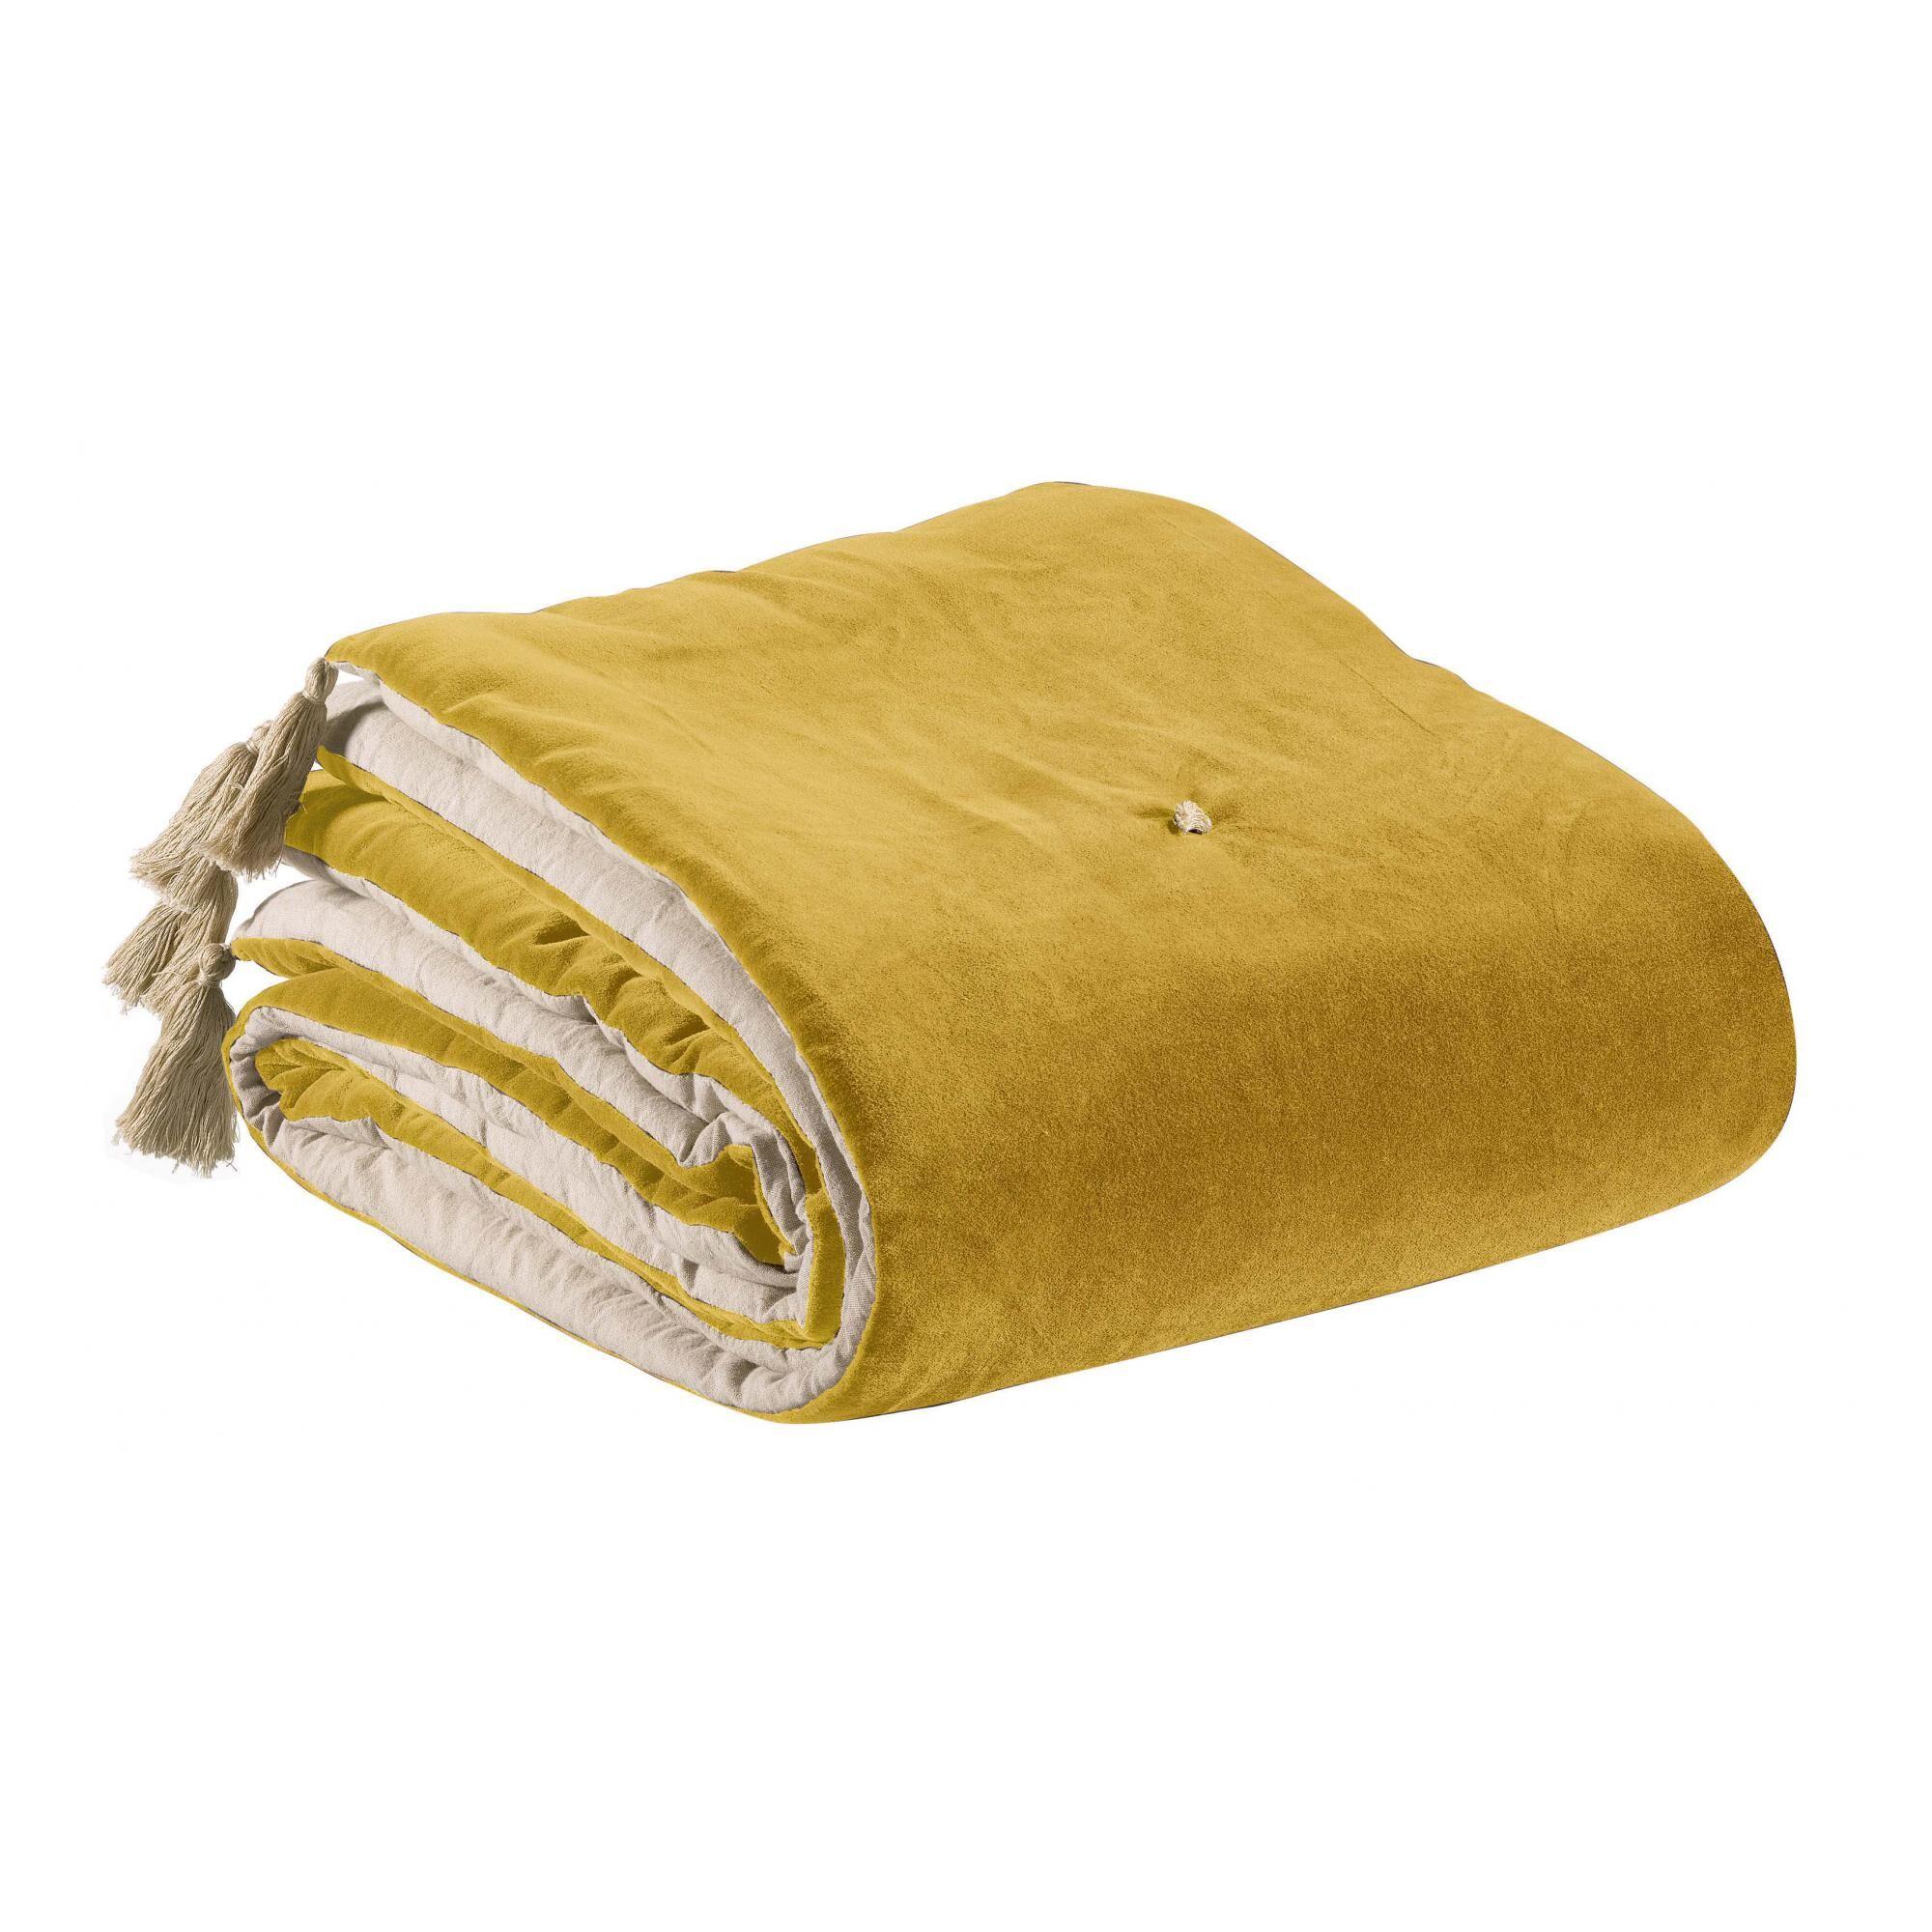 Vivaraise Edredon pompons  en coton mais 80 x 180